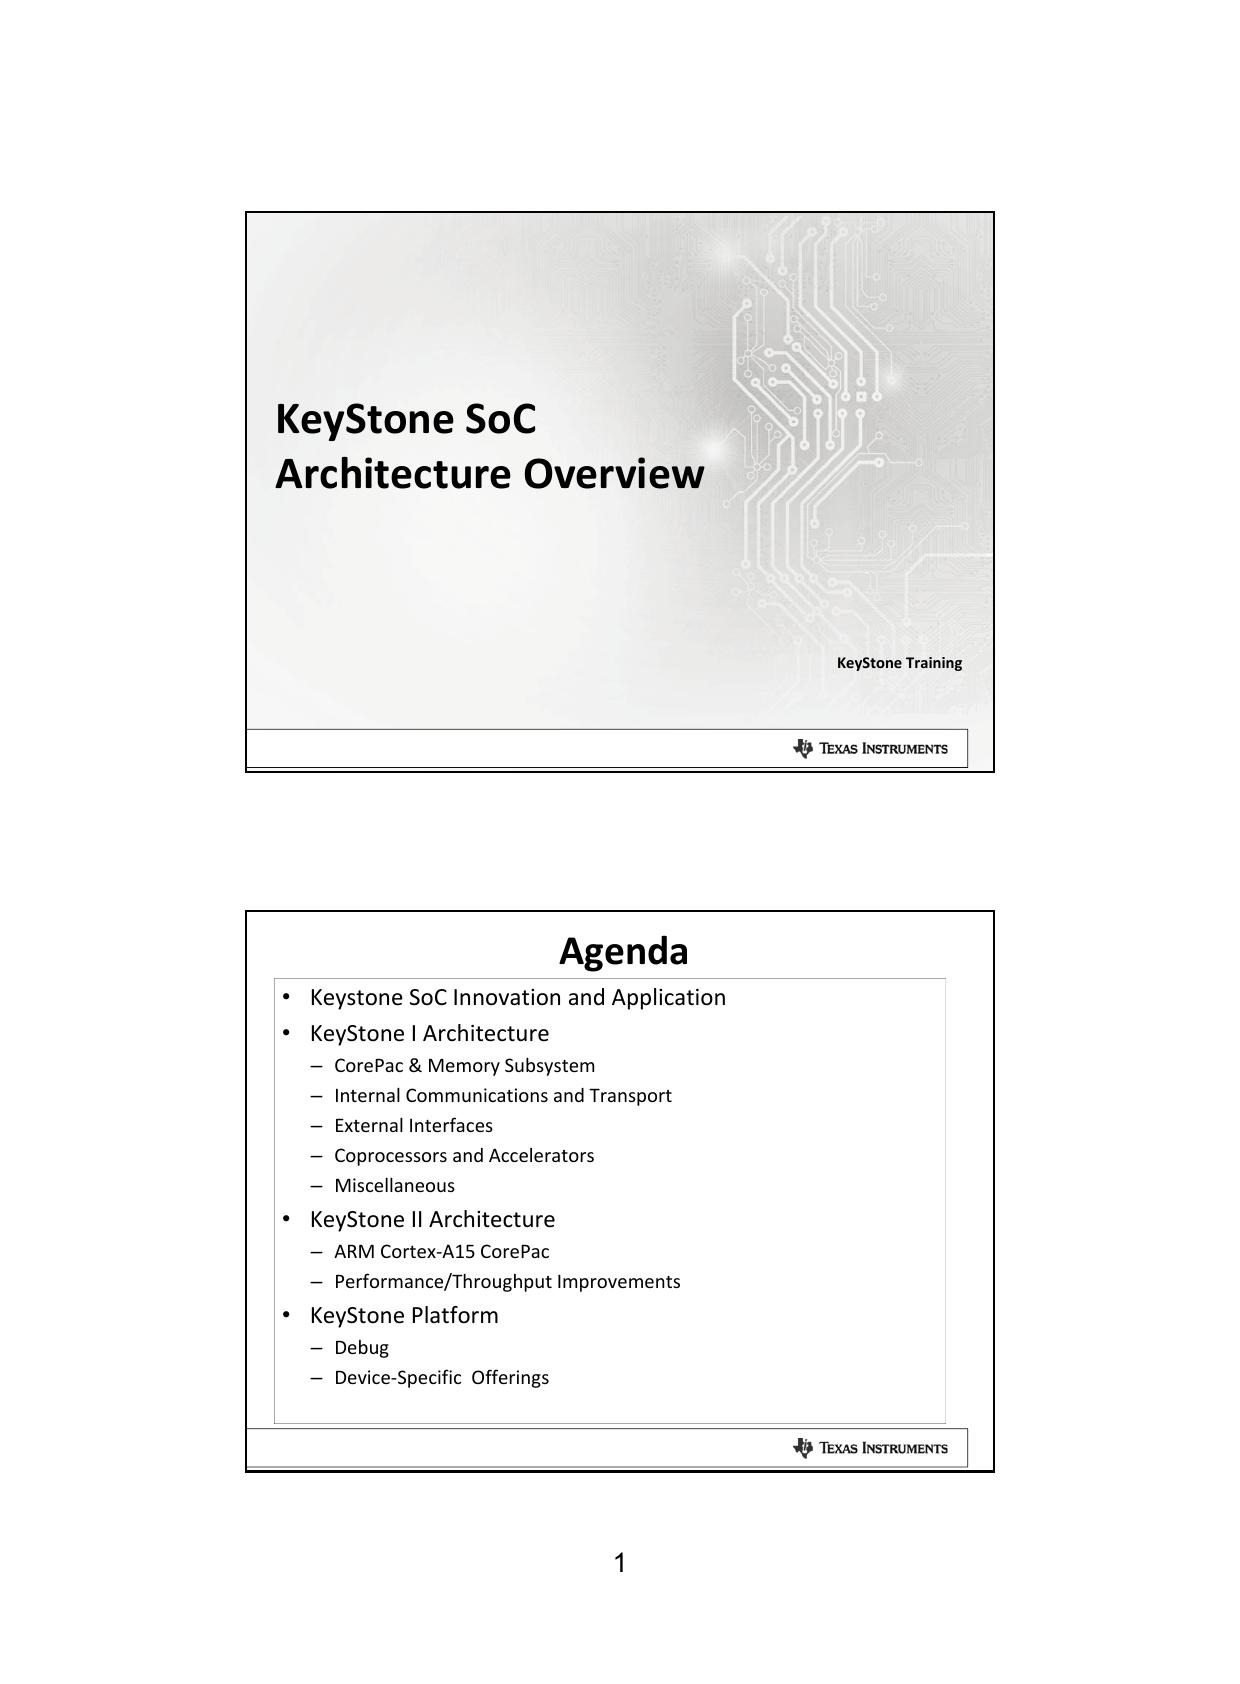 KeyStone SoC Architecture Overview | manualzz com